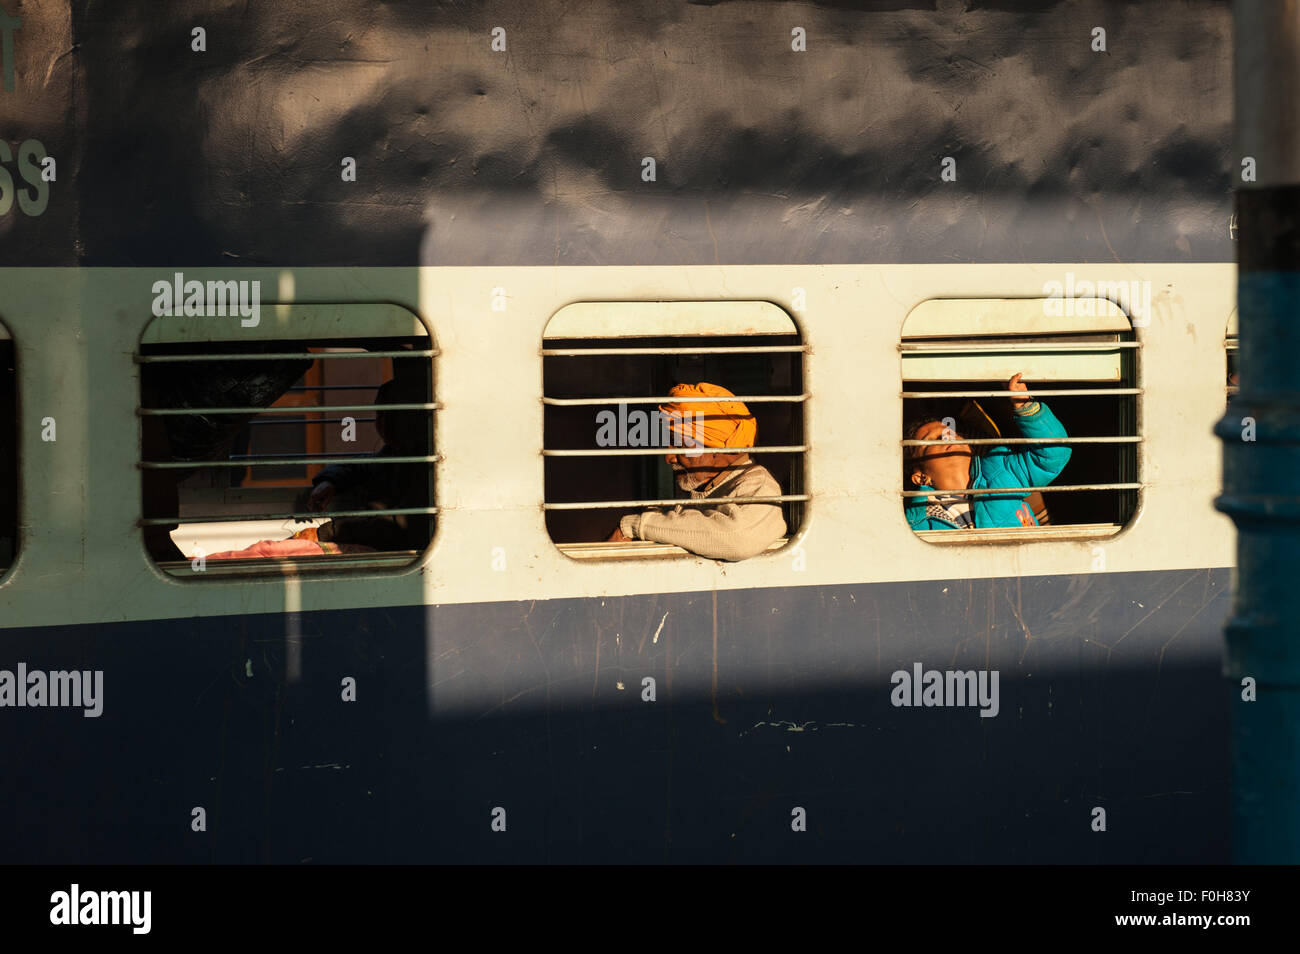 Kalka, Himachal Pradesh, India. passengers on a mainline train through barred windows. - Stock Image